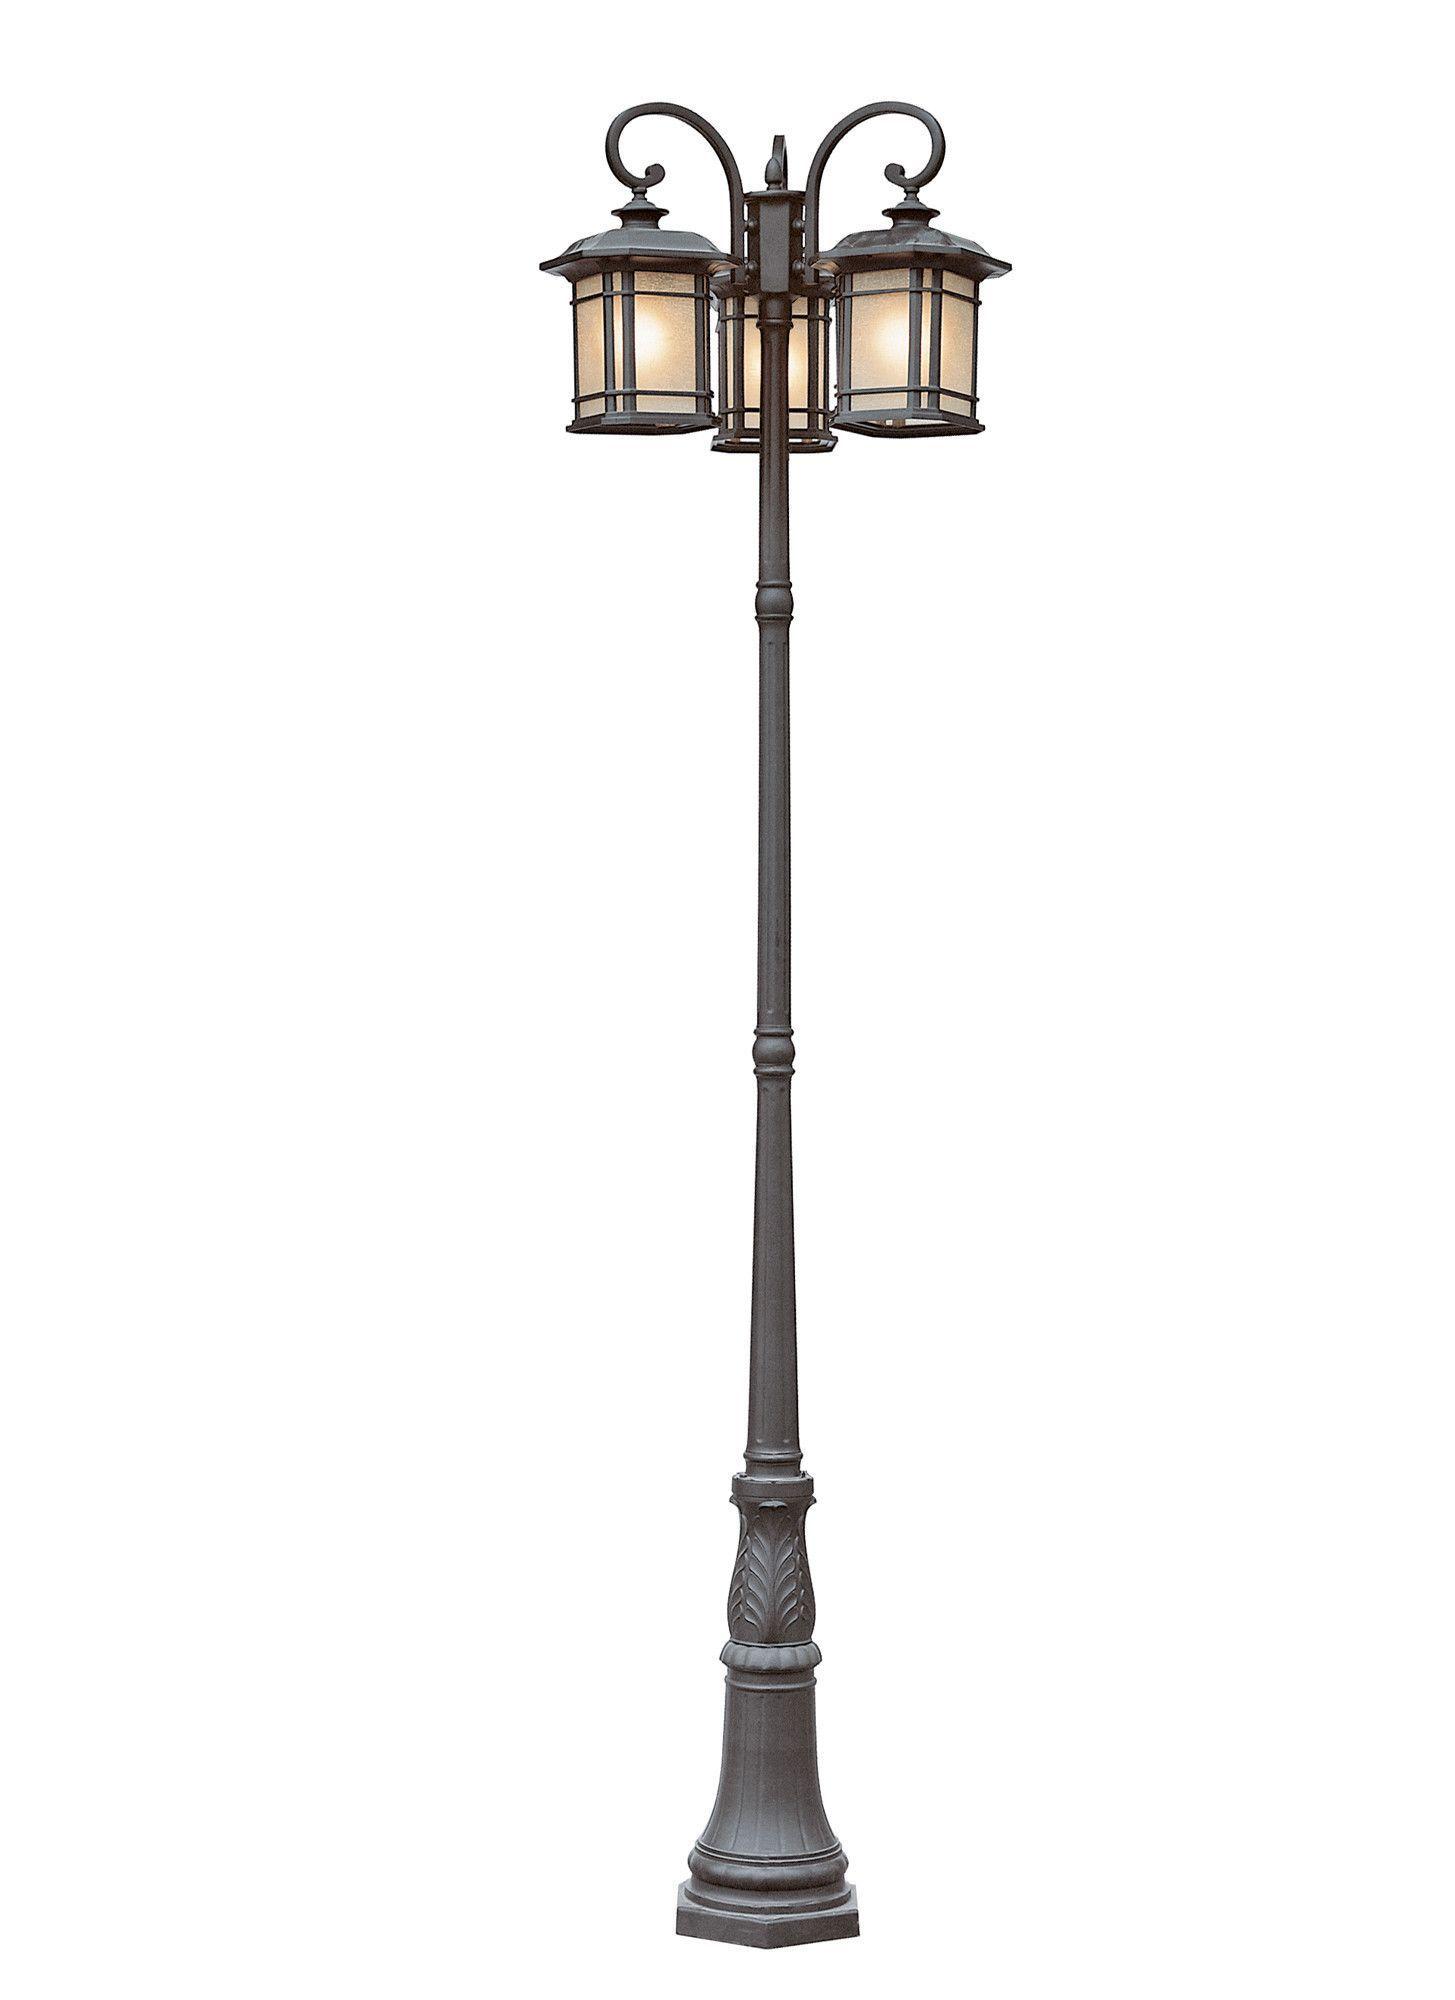 Trans Globe Lighting 5827 Bk Corner Windows 3 Lantern Lamp Post Lamp Post Lights Post Lights Outdoor Post Lights